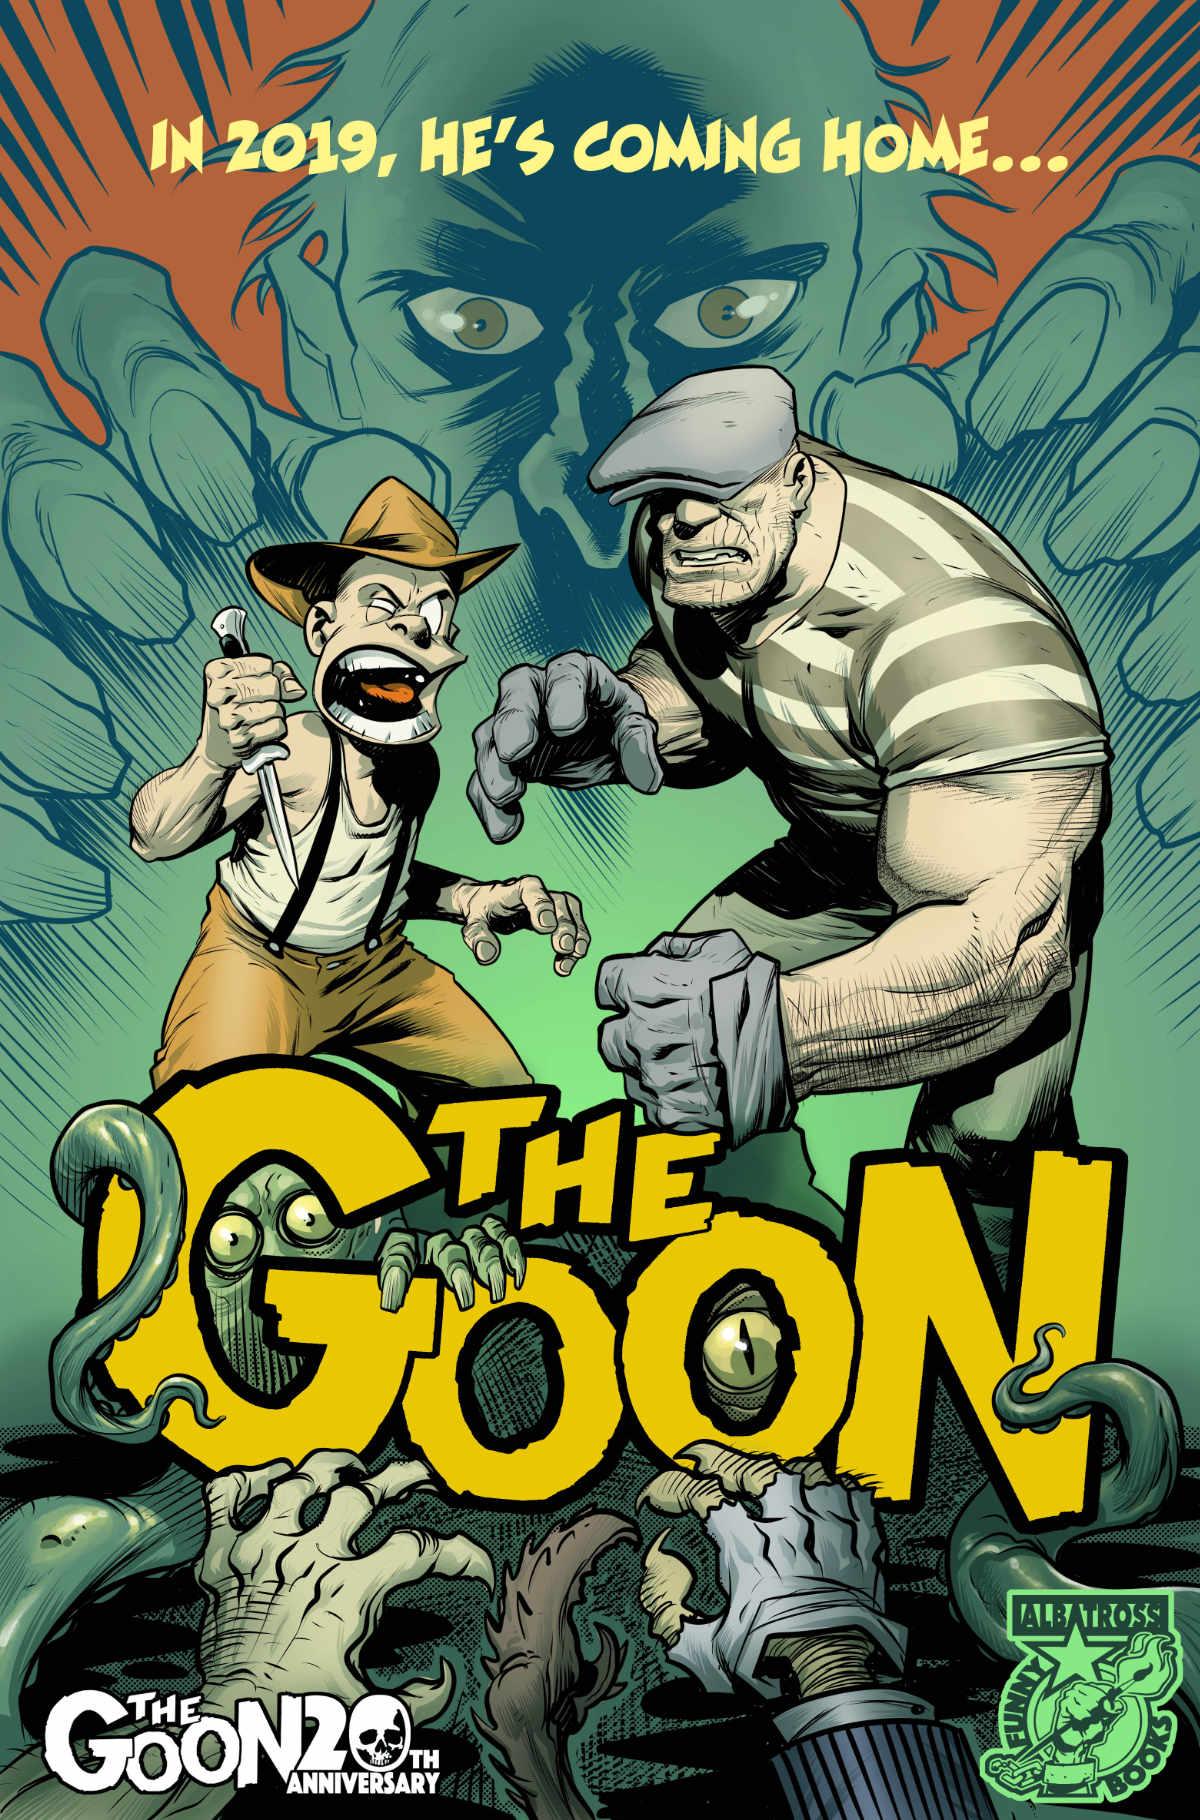 The Goon Returns to Atomik Pop!